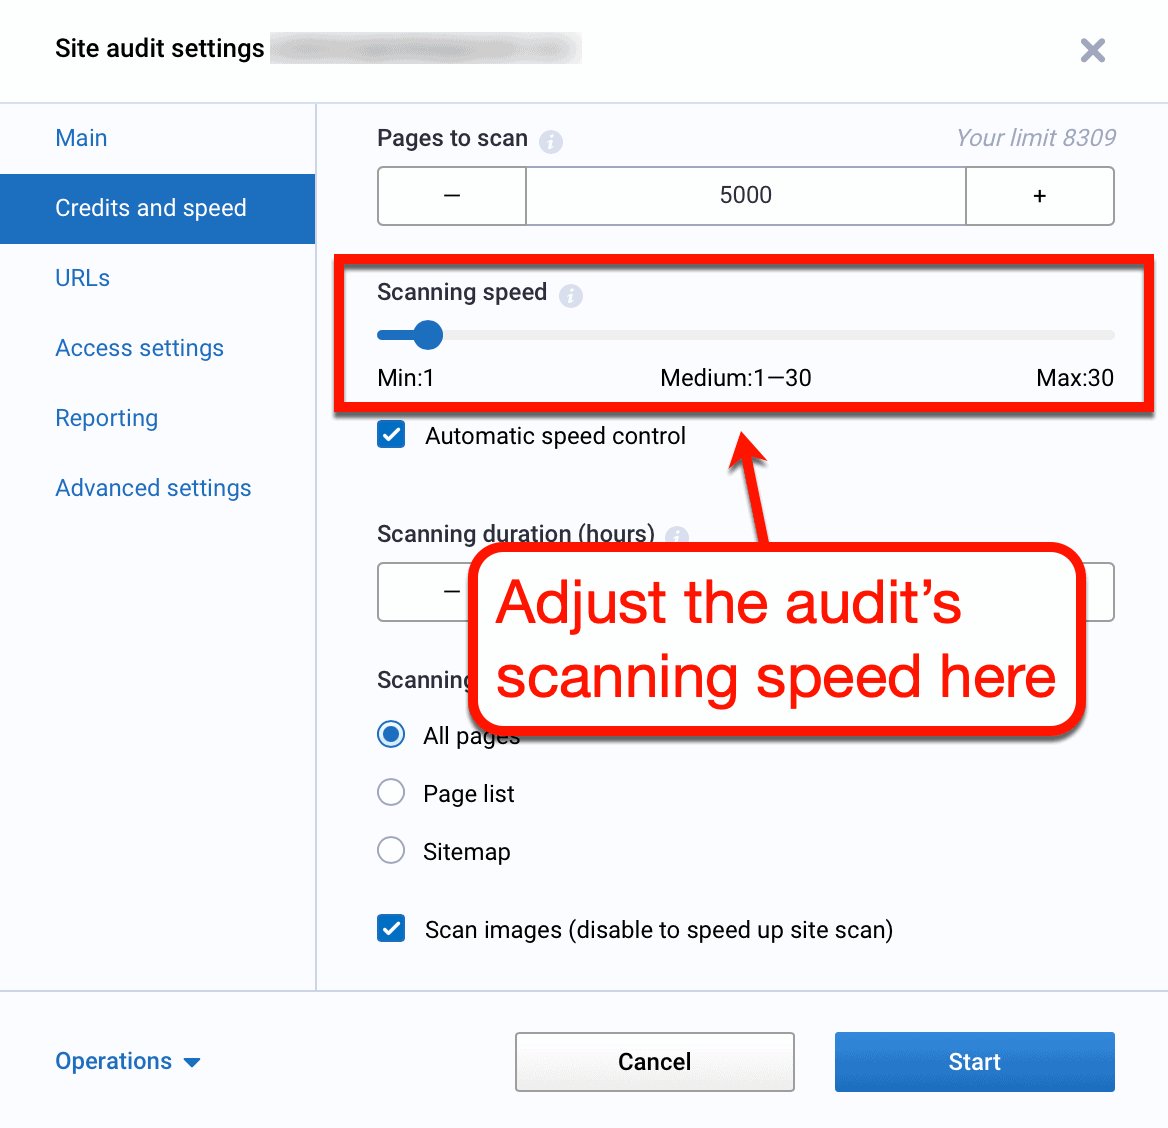 Site Audit Scanning Speed Settings